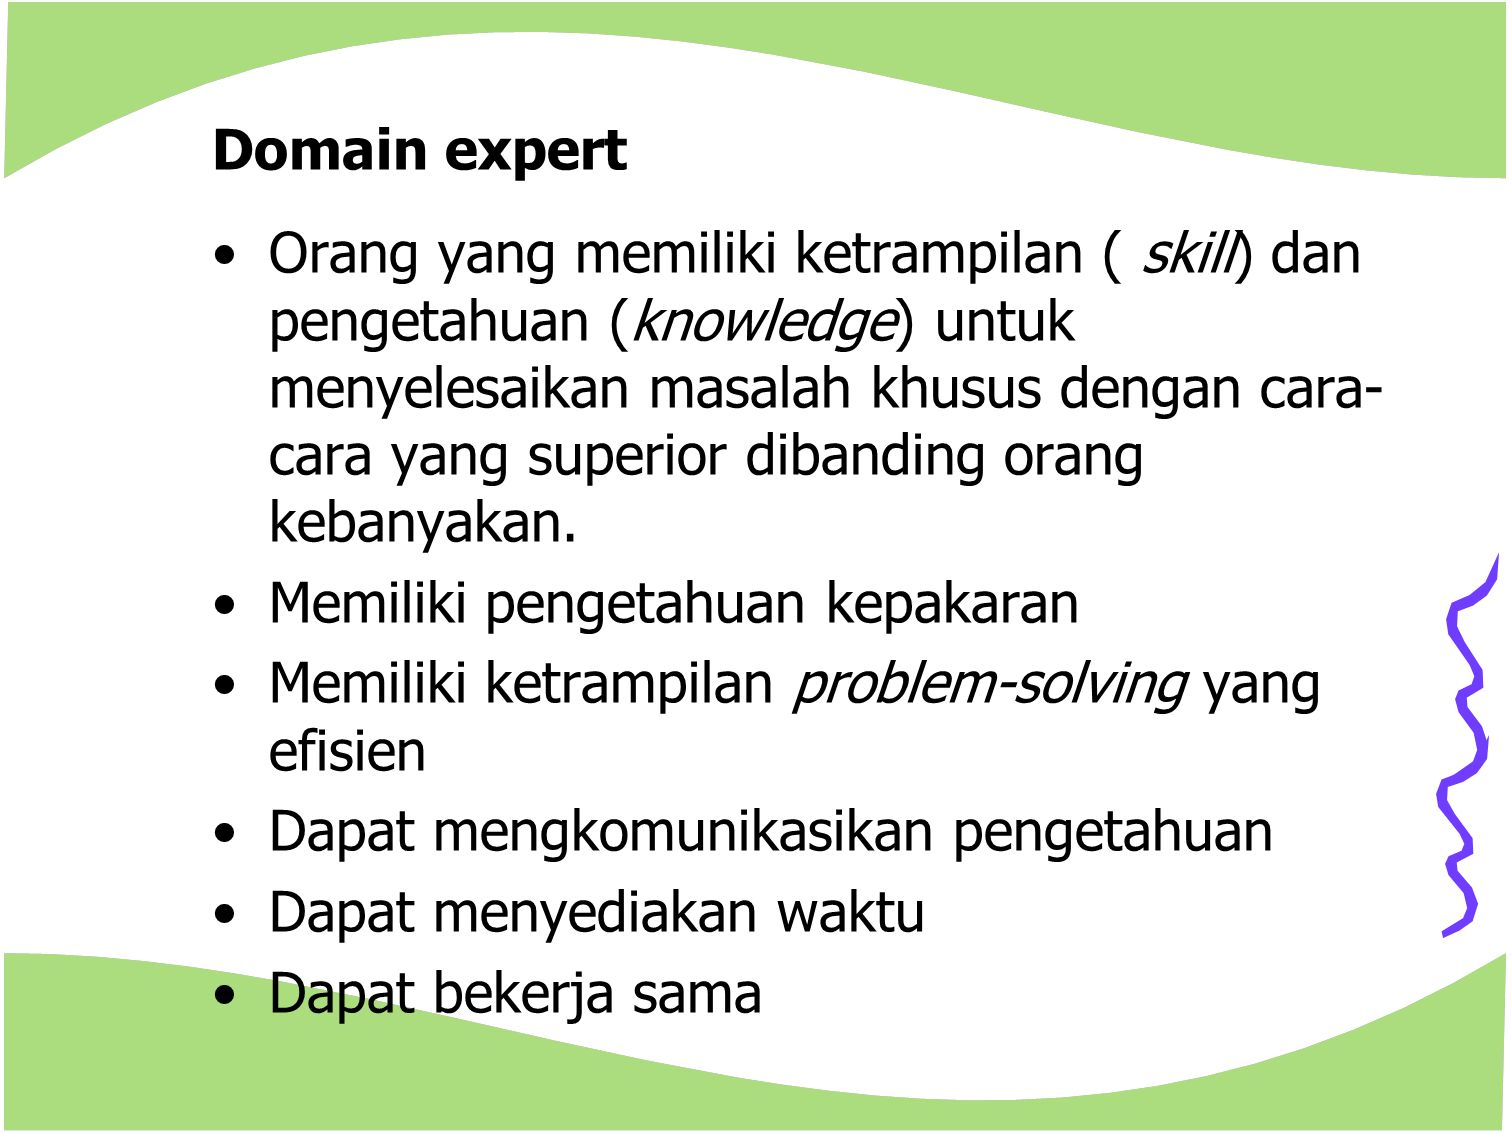 Domain expert